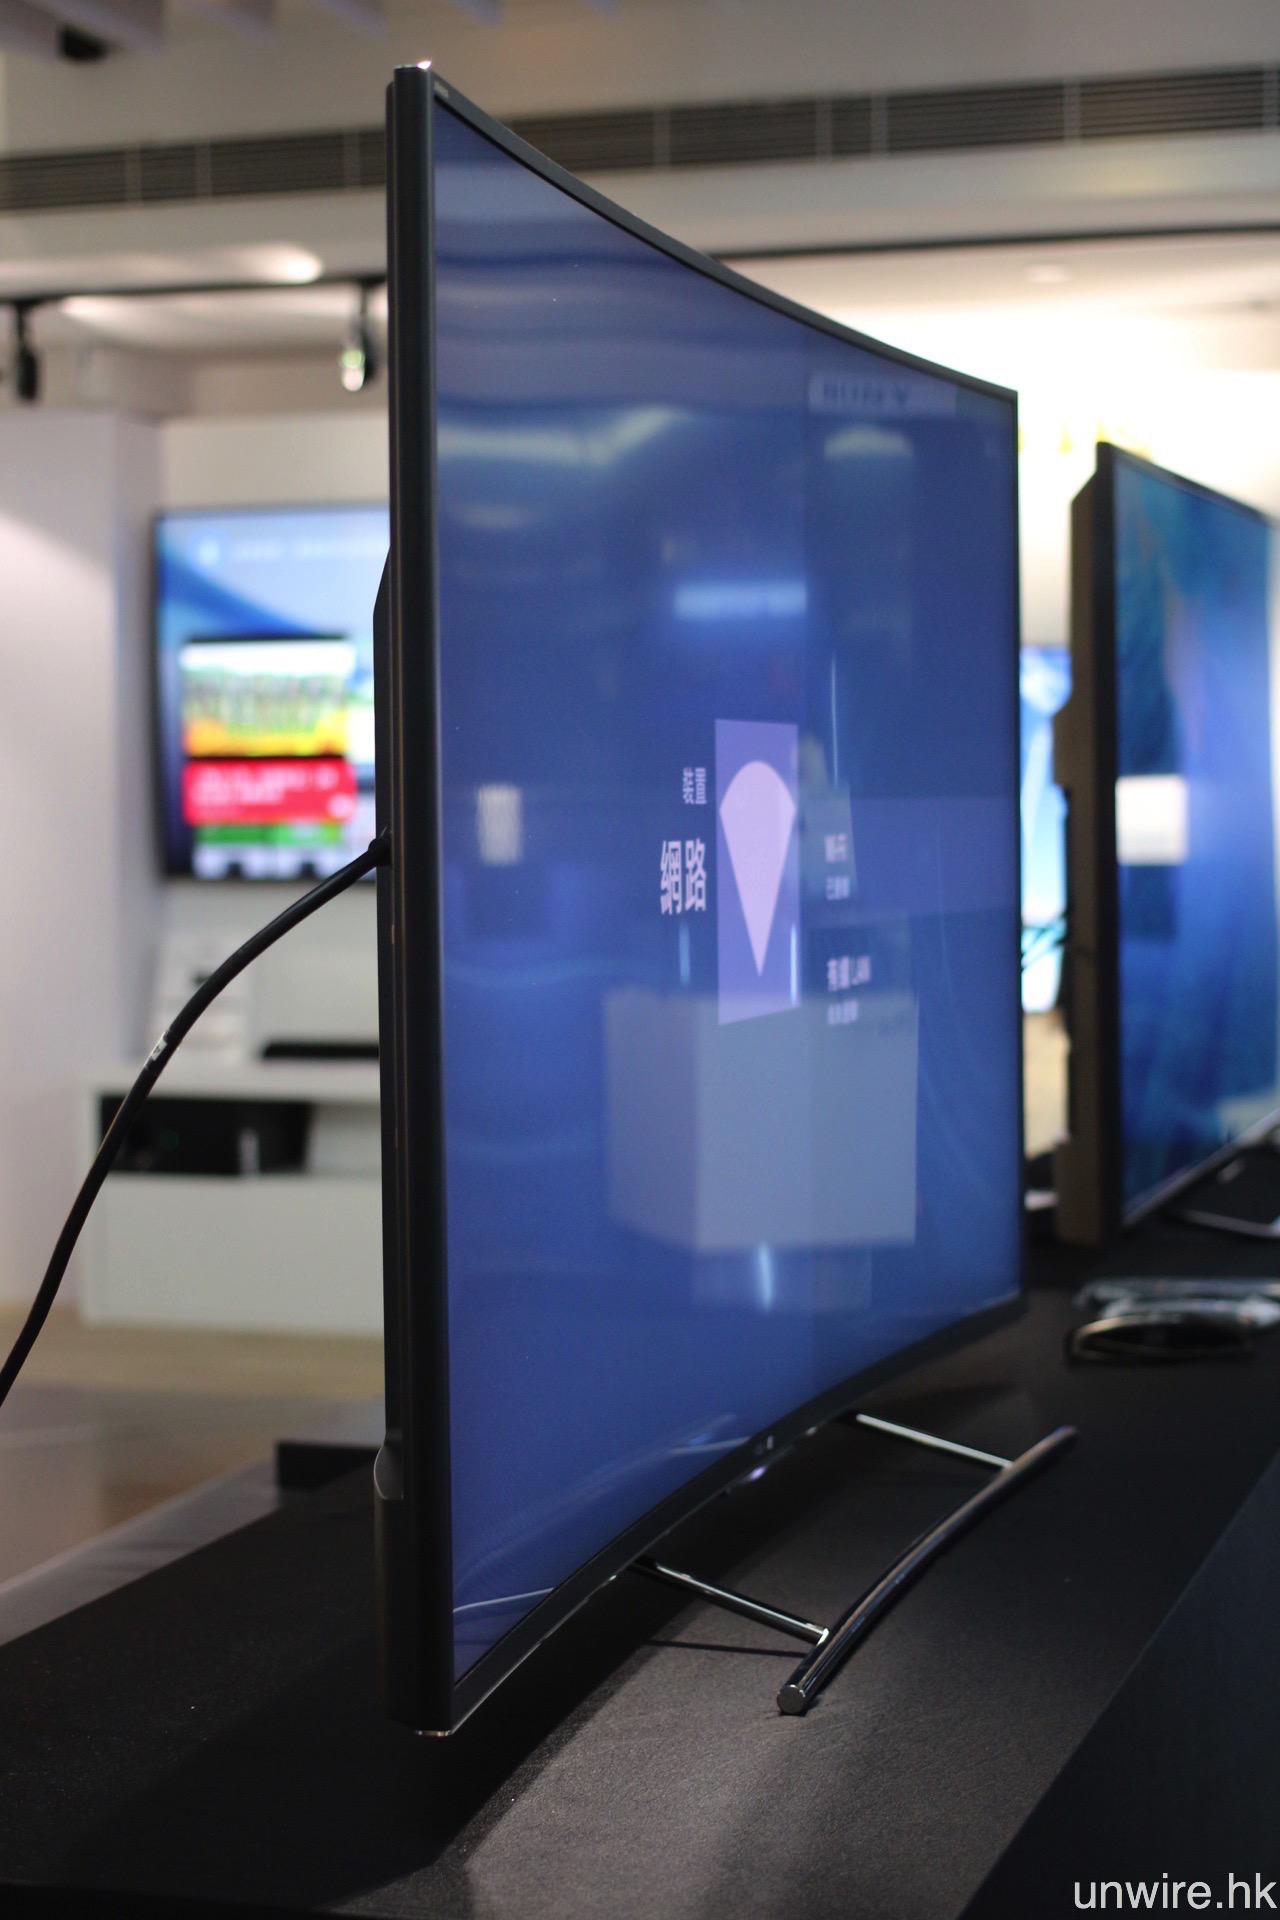 艾域:「 弧得剛剛好」- Sony BRAVIA S8500C 4K 弧面 Android 電視初步評測